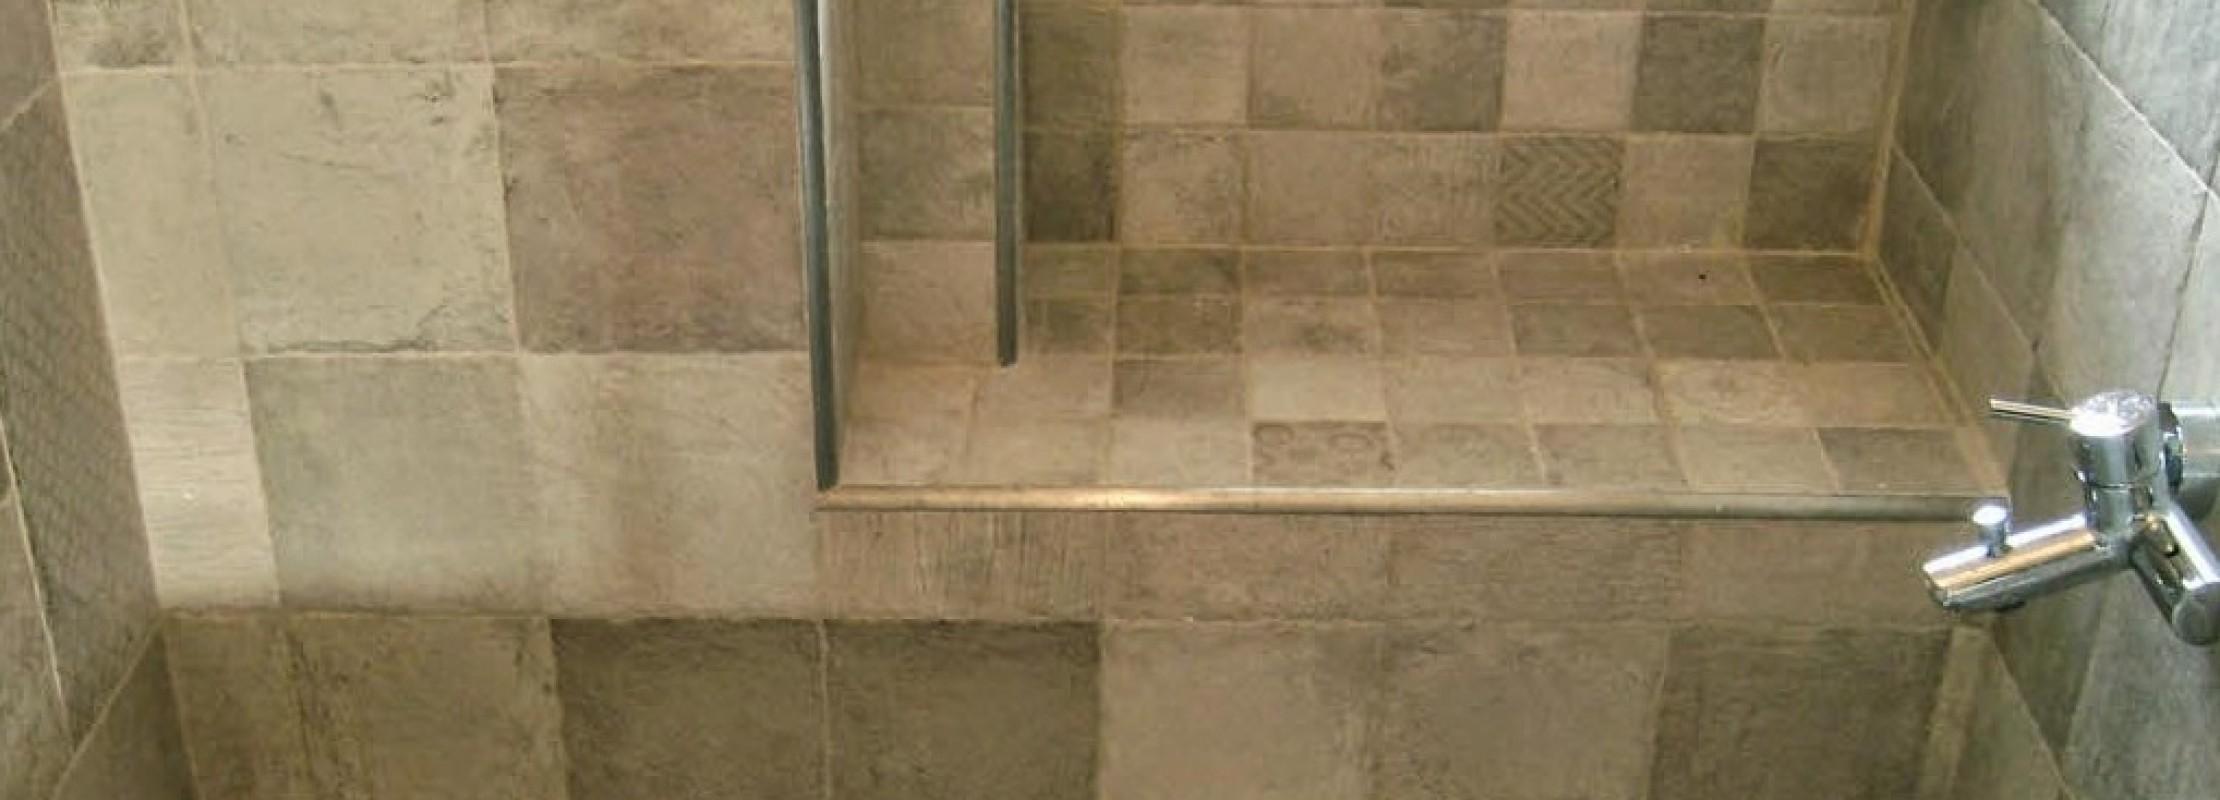 Bagni Classici Con Mosaico.Bagni Classici In Muratura Blog Edilnet